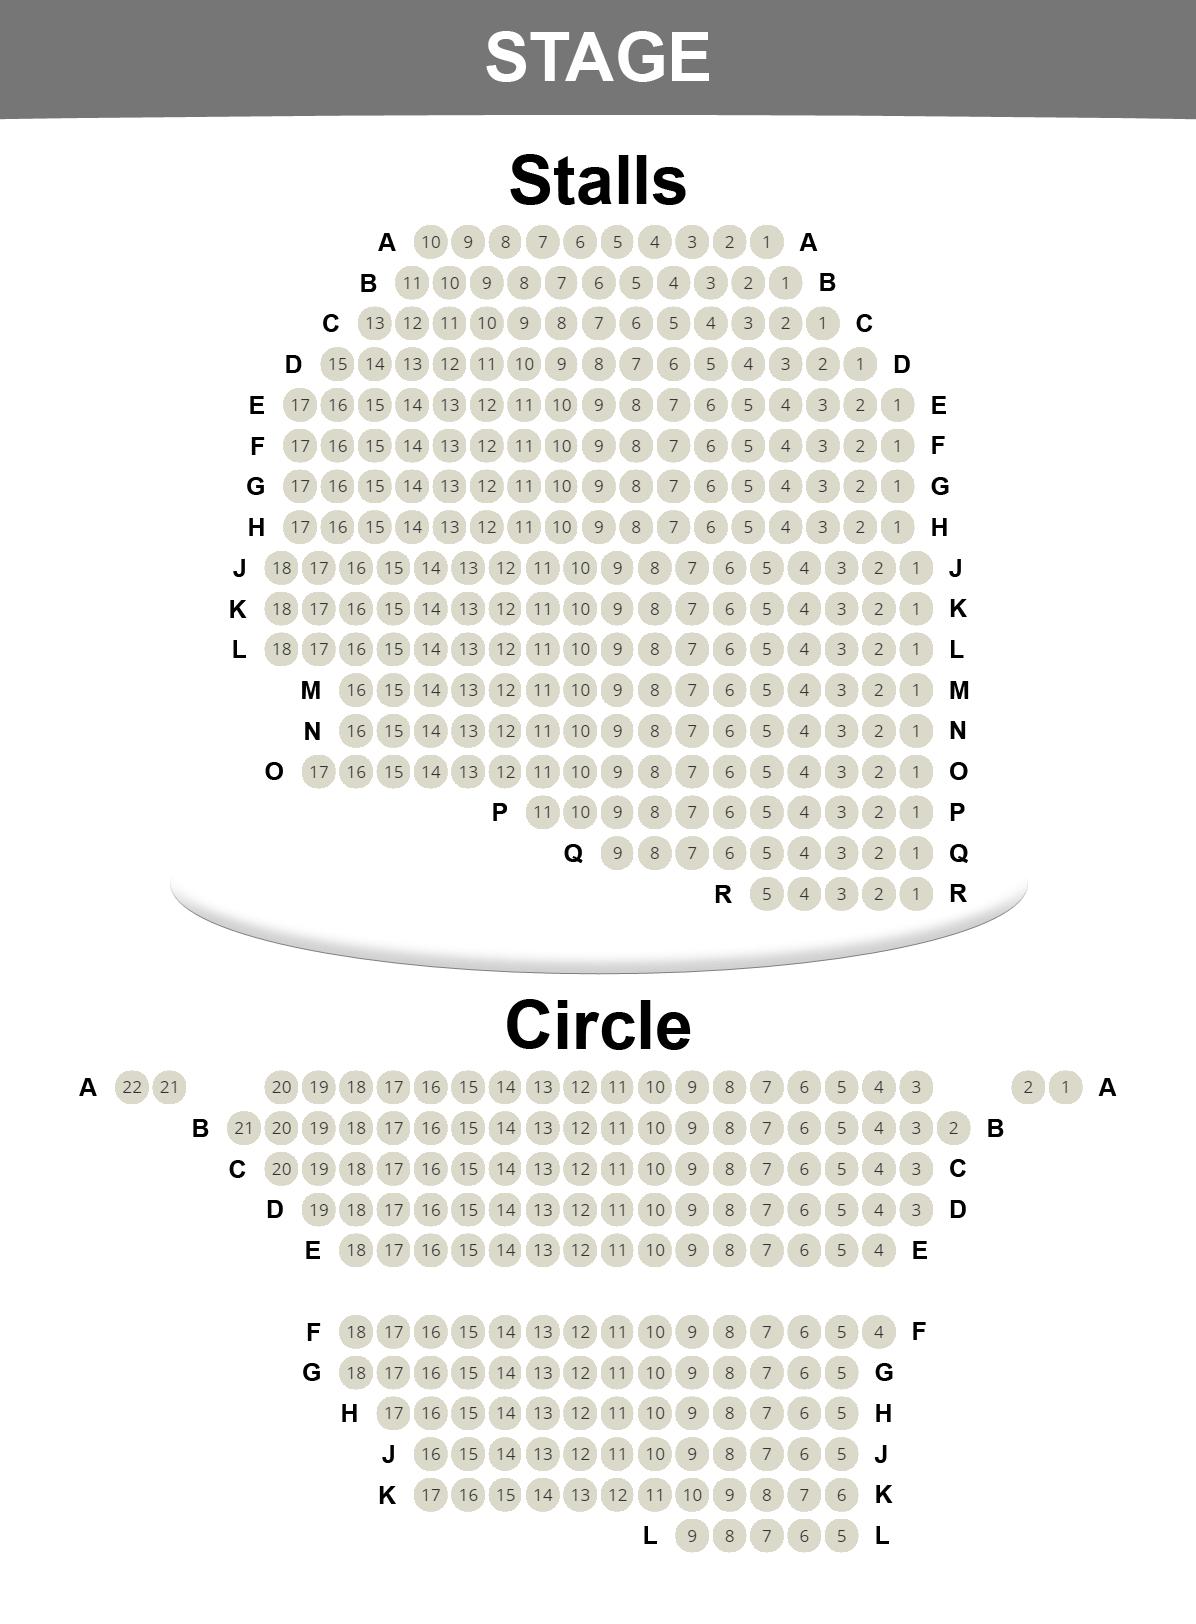 Ambassadors Theatre seating plan